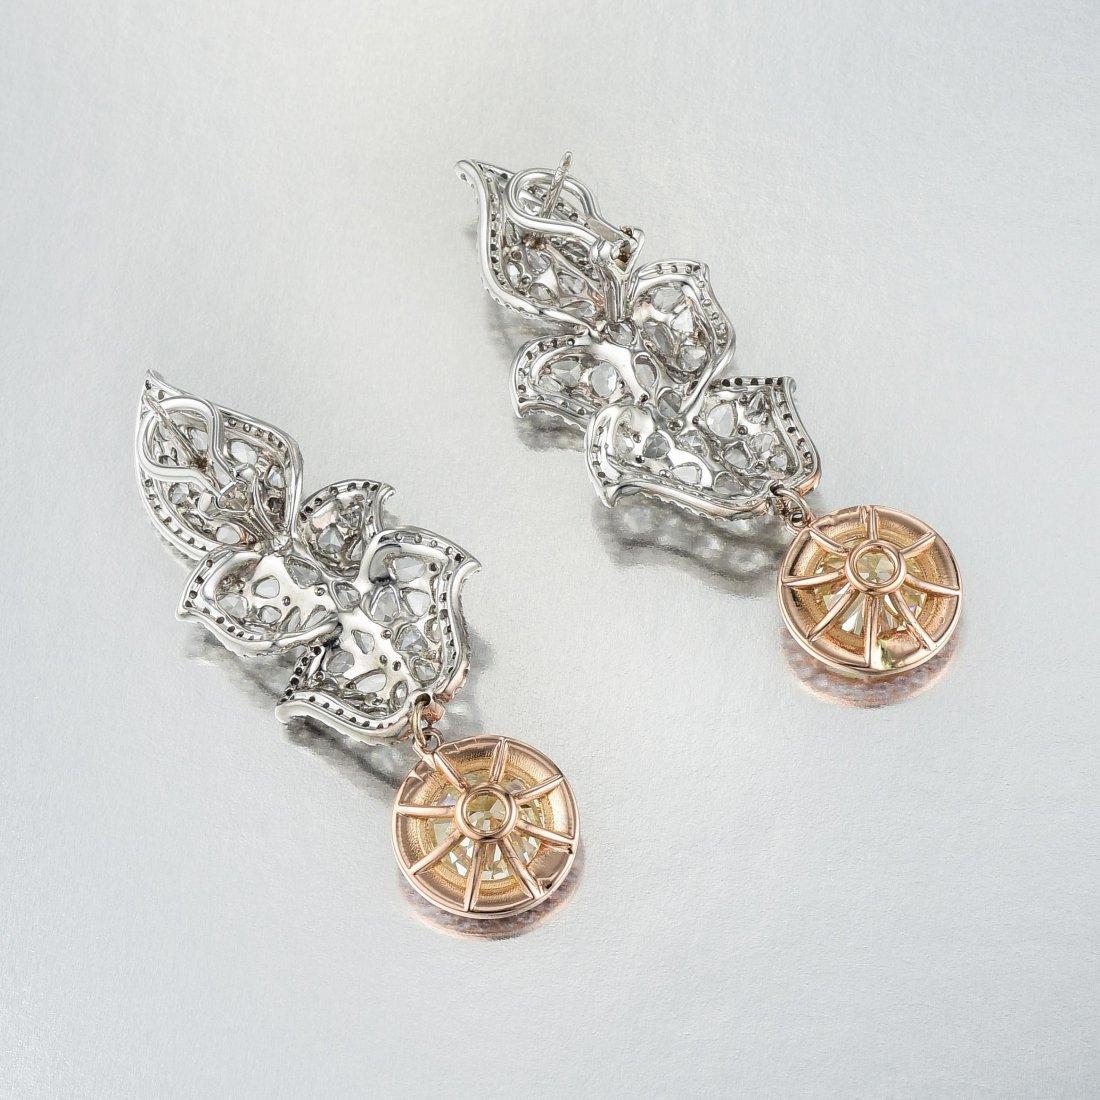 A Pair of Old European-Cut Diamond Earrings - 5